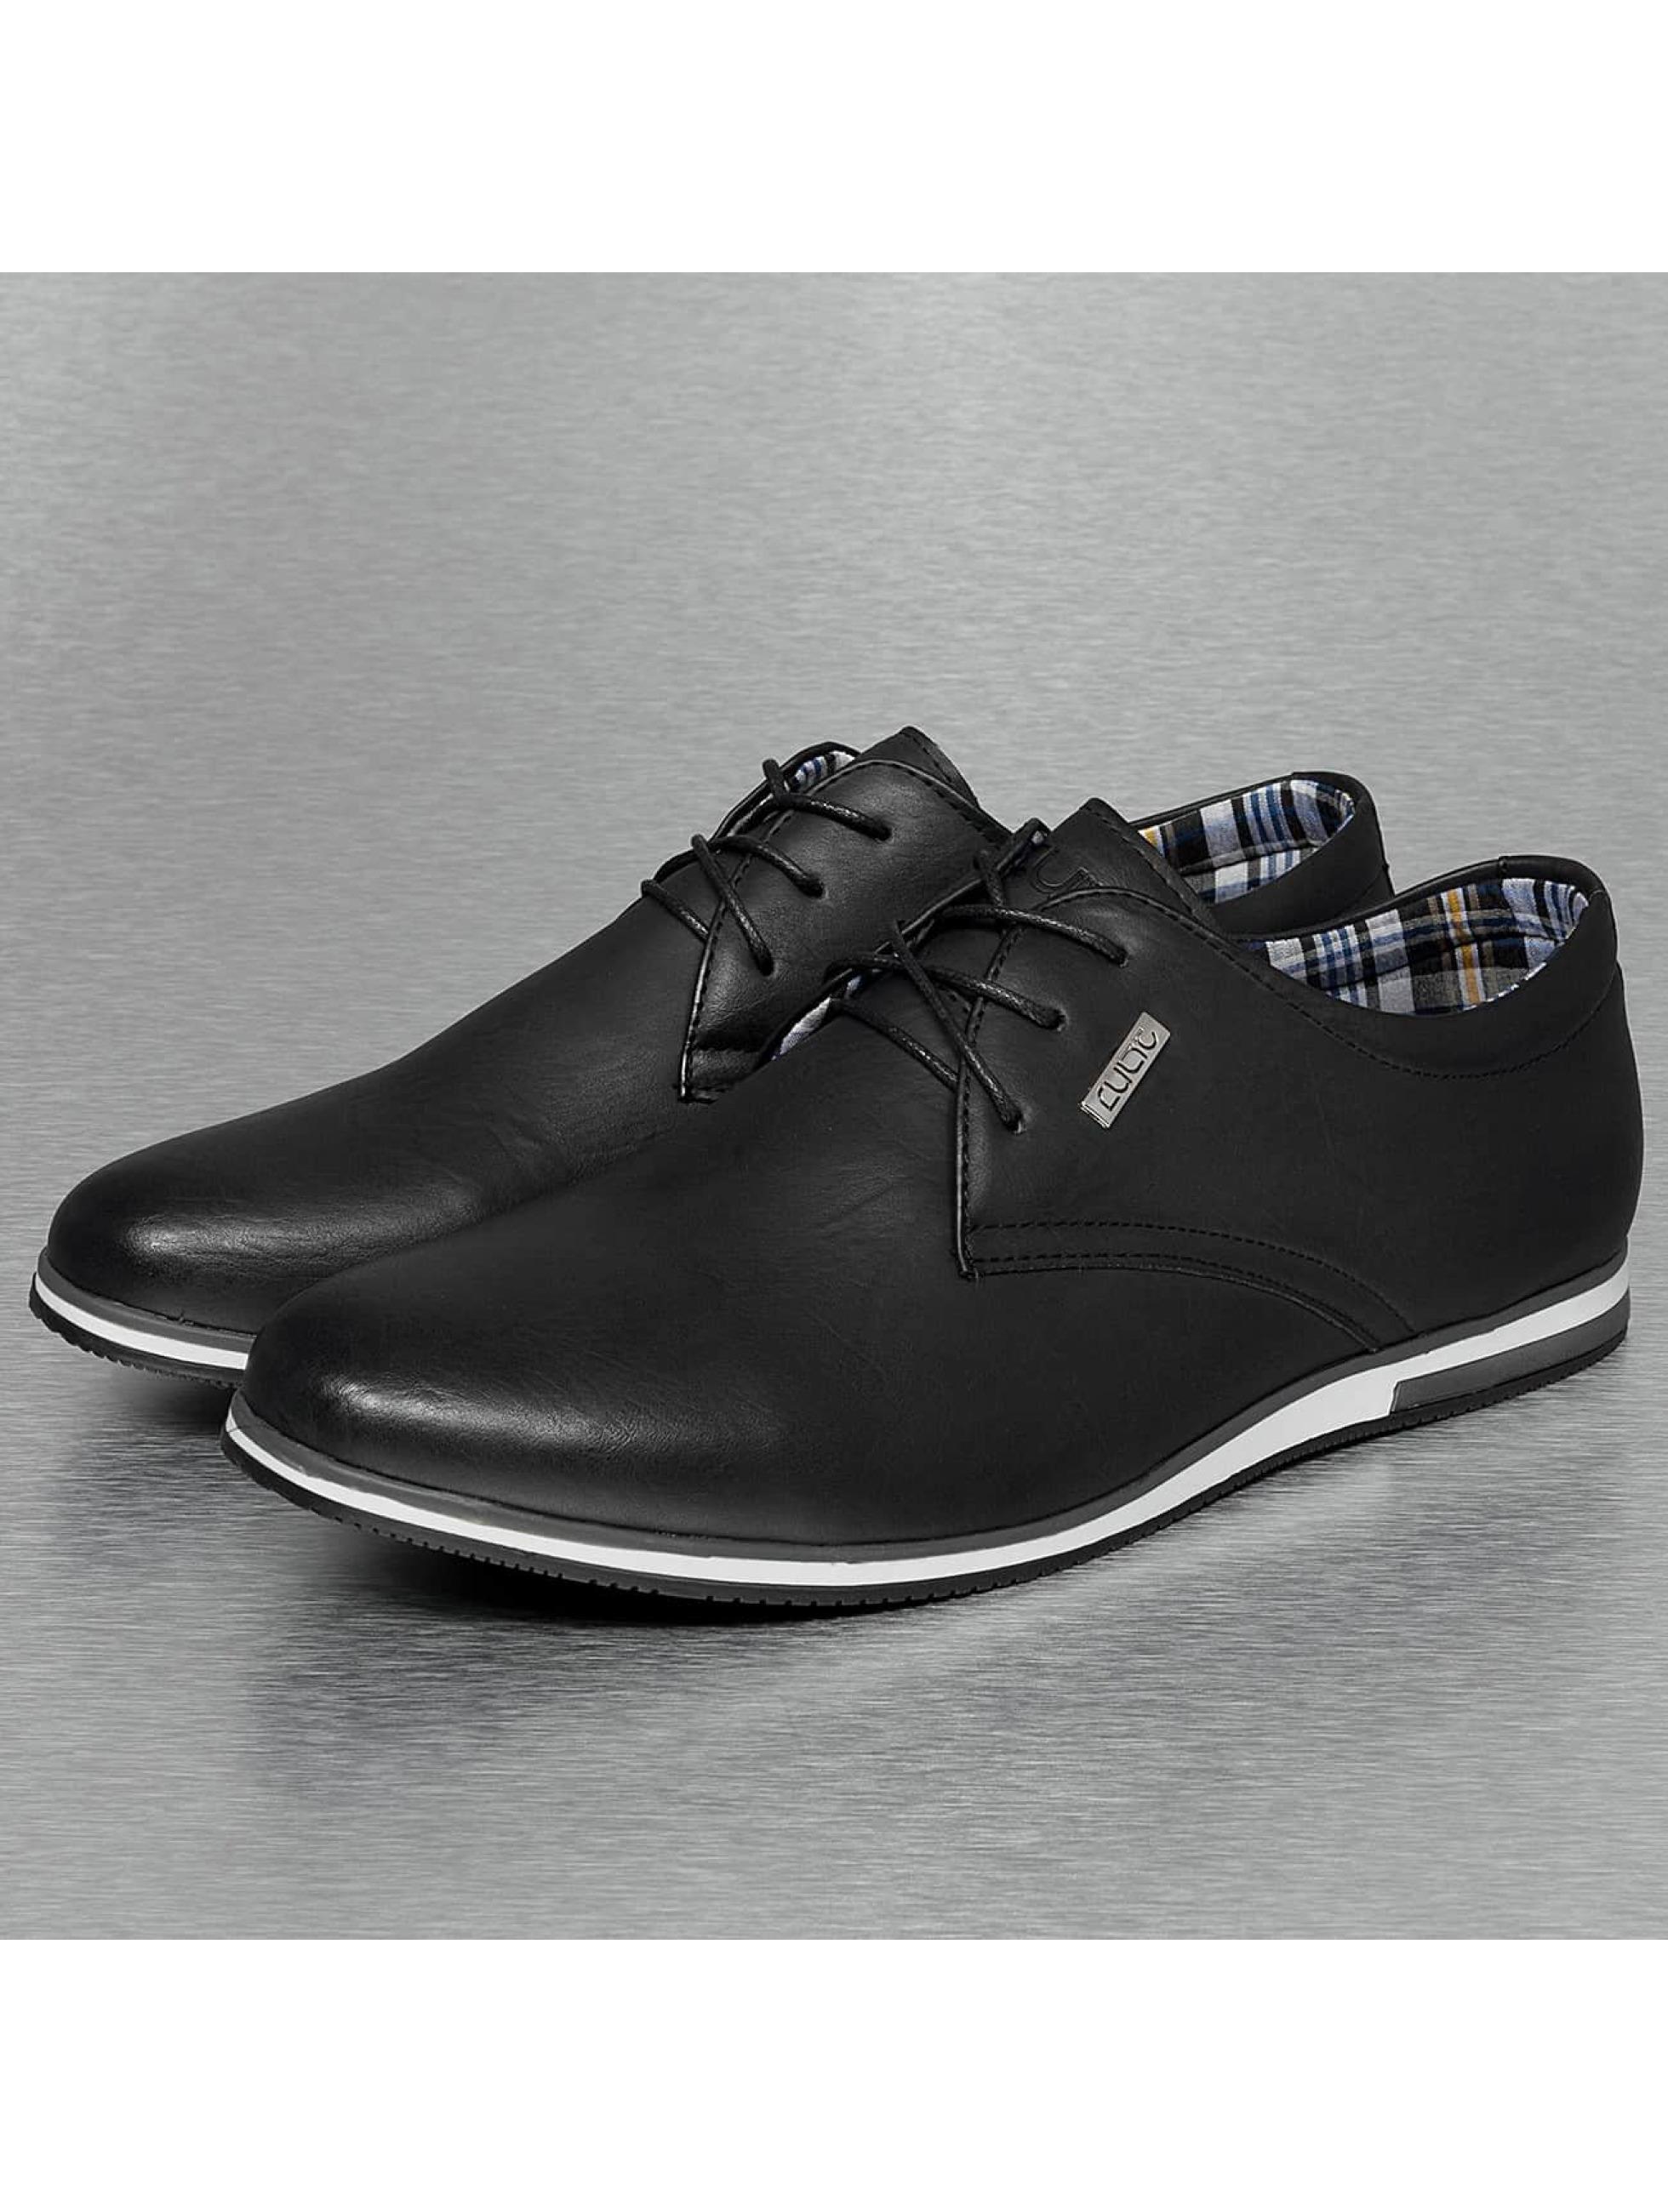 New York Style Männer Sneaker Galway in schwarz Sale Angebote Döbern